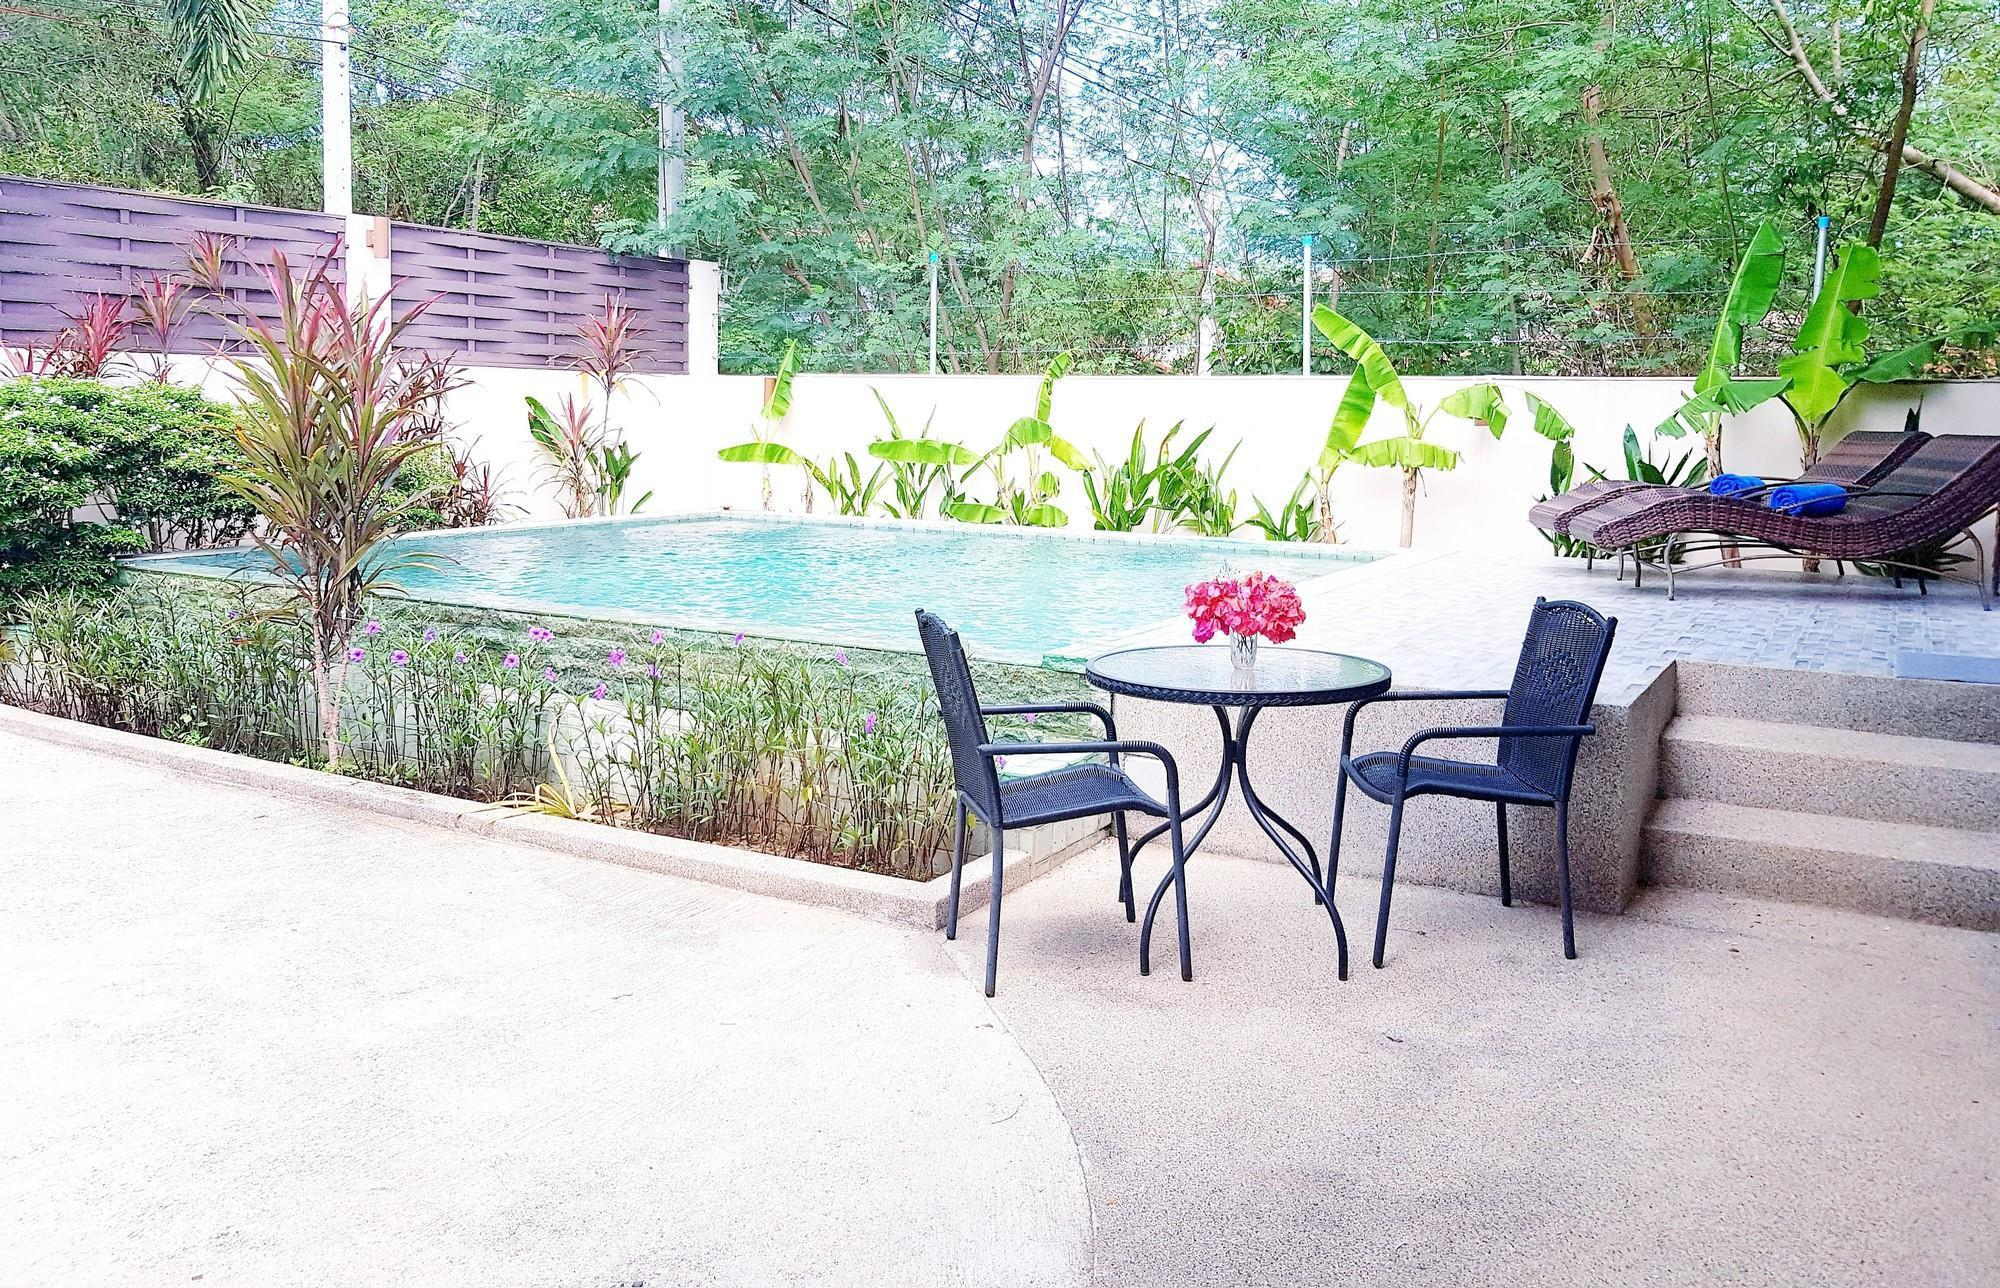 Villa BAVARIA 3 with private pool in LAMAI วิลลา 2 ห้องนอน 2 ห้องน้ำส่วนตัว ขนาด 95 ตร.ม. – หาดละไม